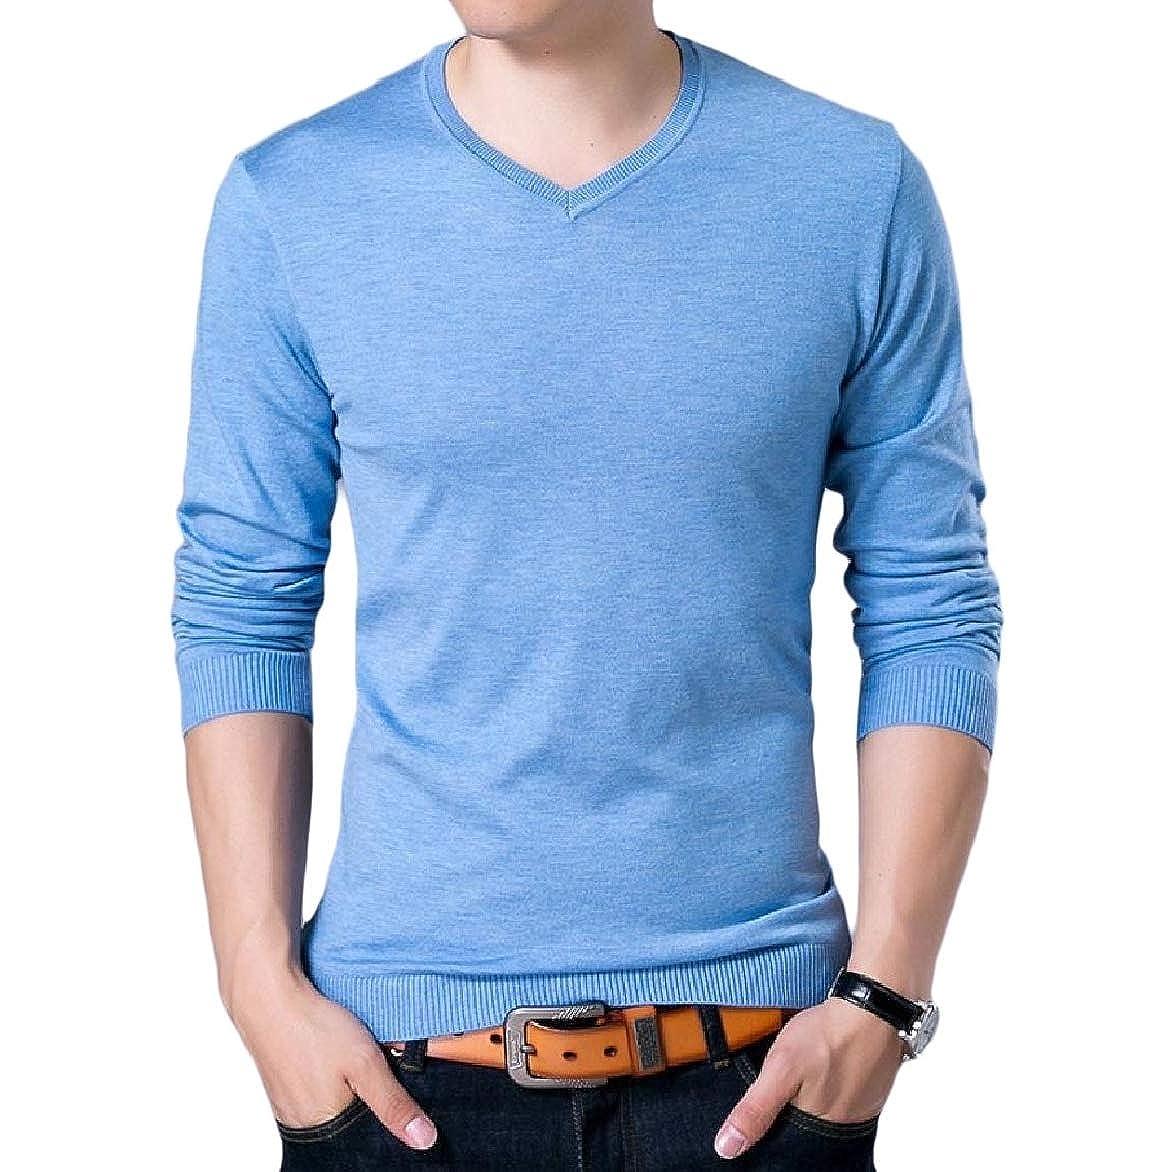 YUNY Men Knit Slim Juniors Fall Winter Long Sleeve Pullover Sweaters Sky Blue S